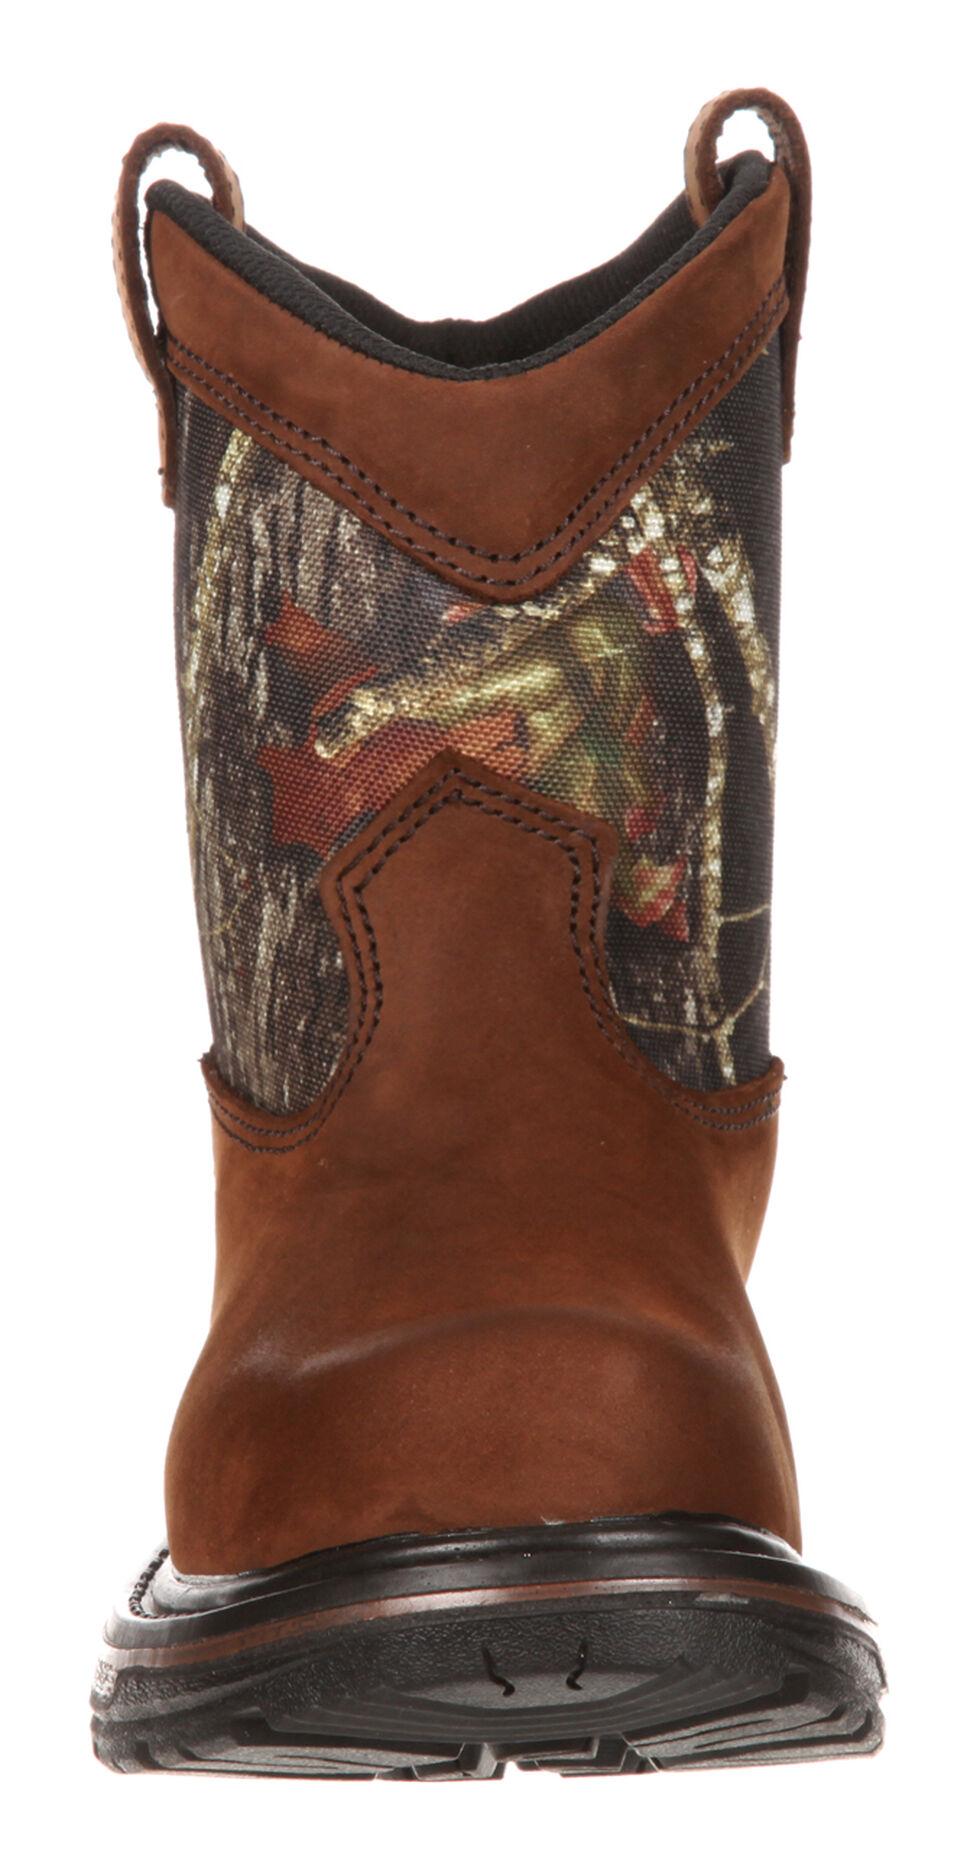 Rocky Boys' Ride Wellington Waterproof Boots, Brown, hi-res